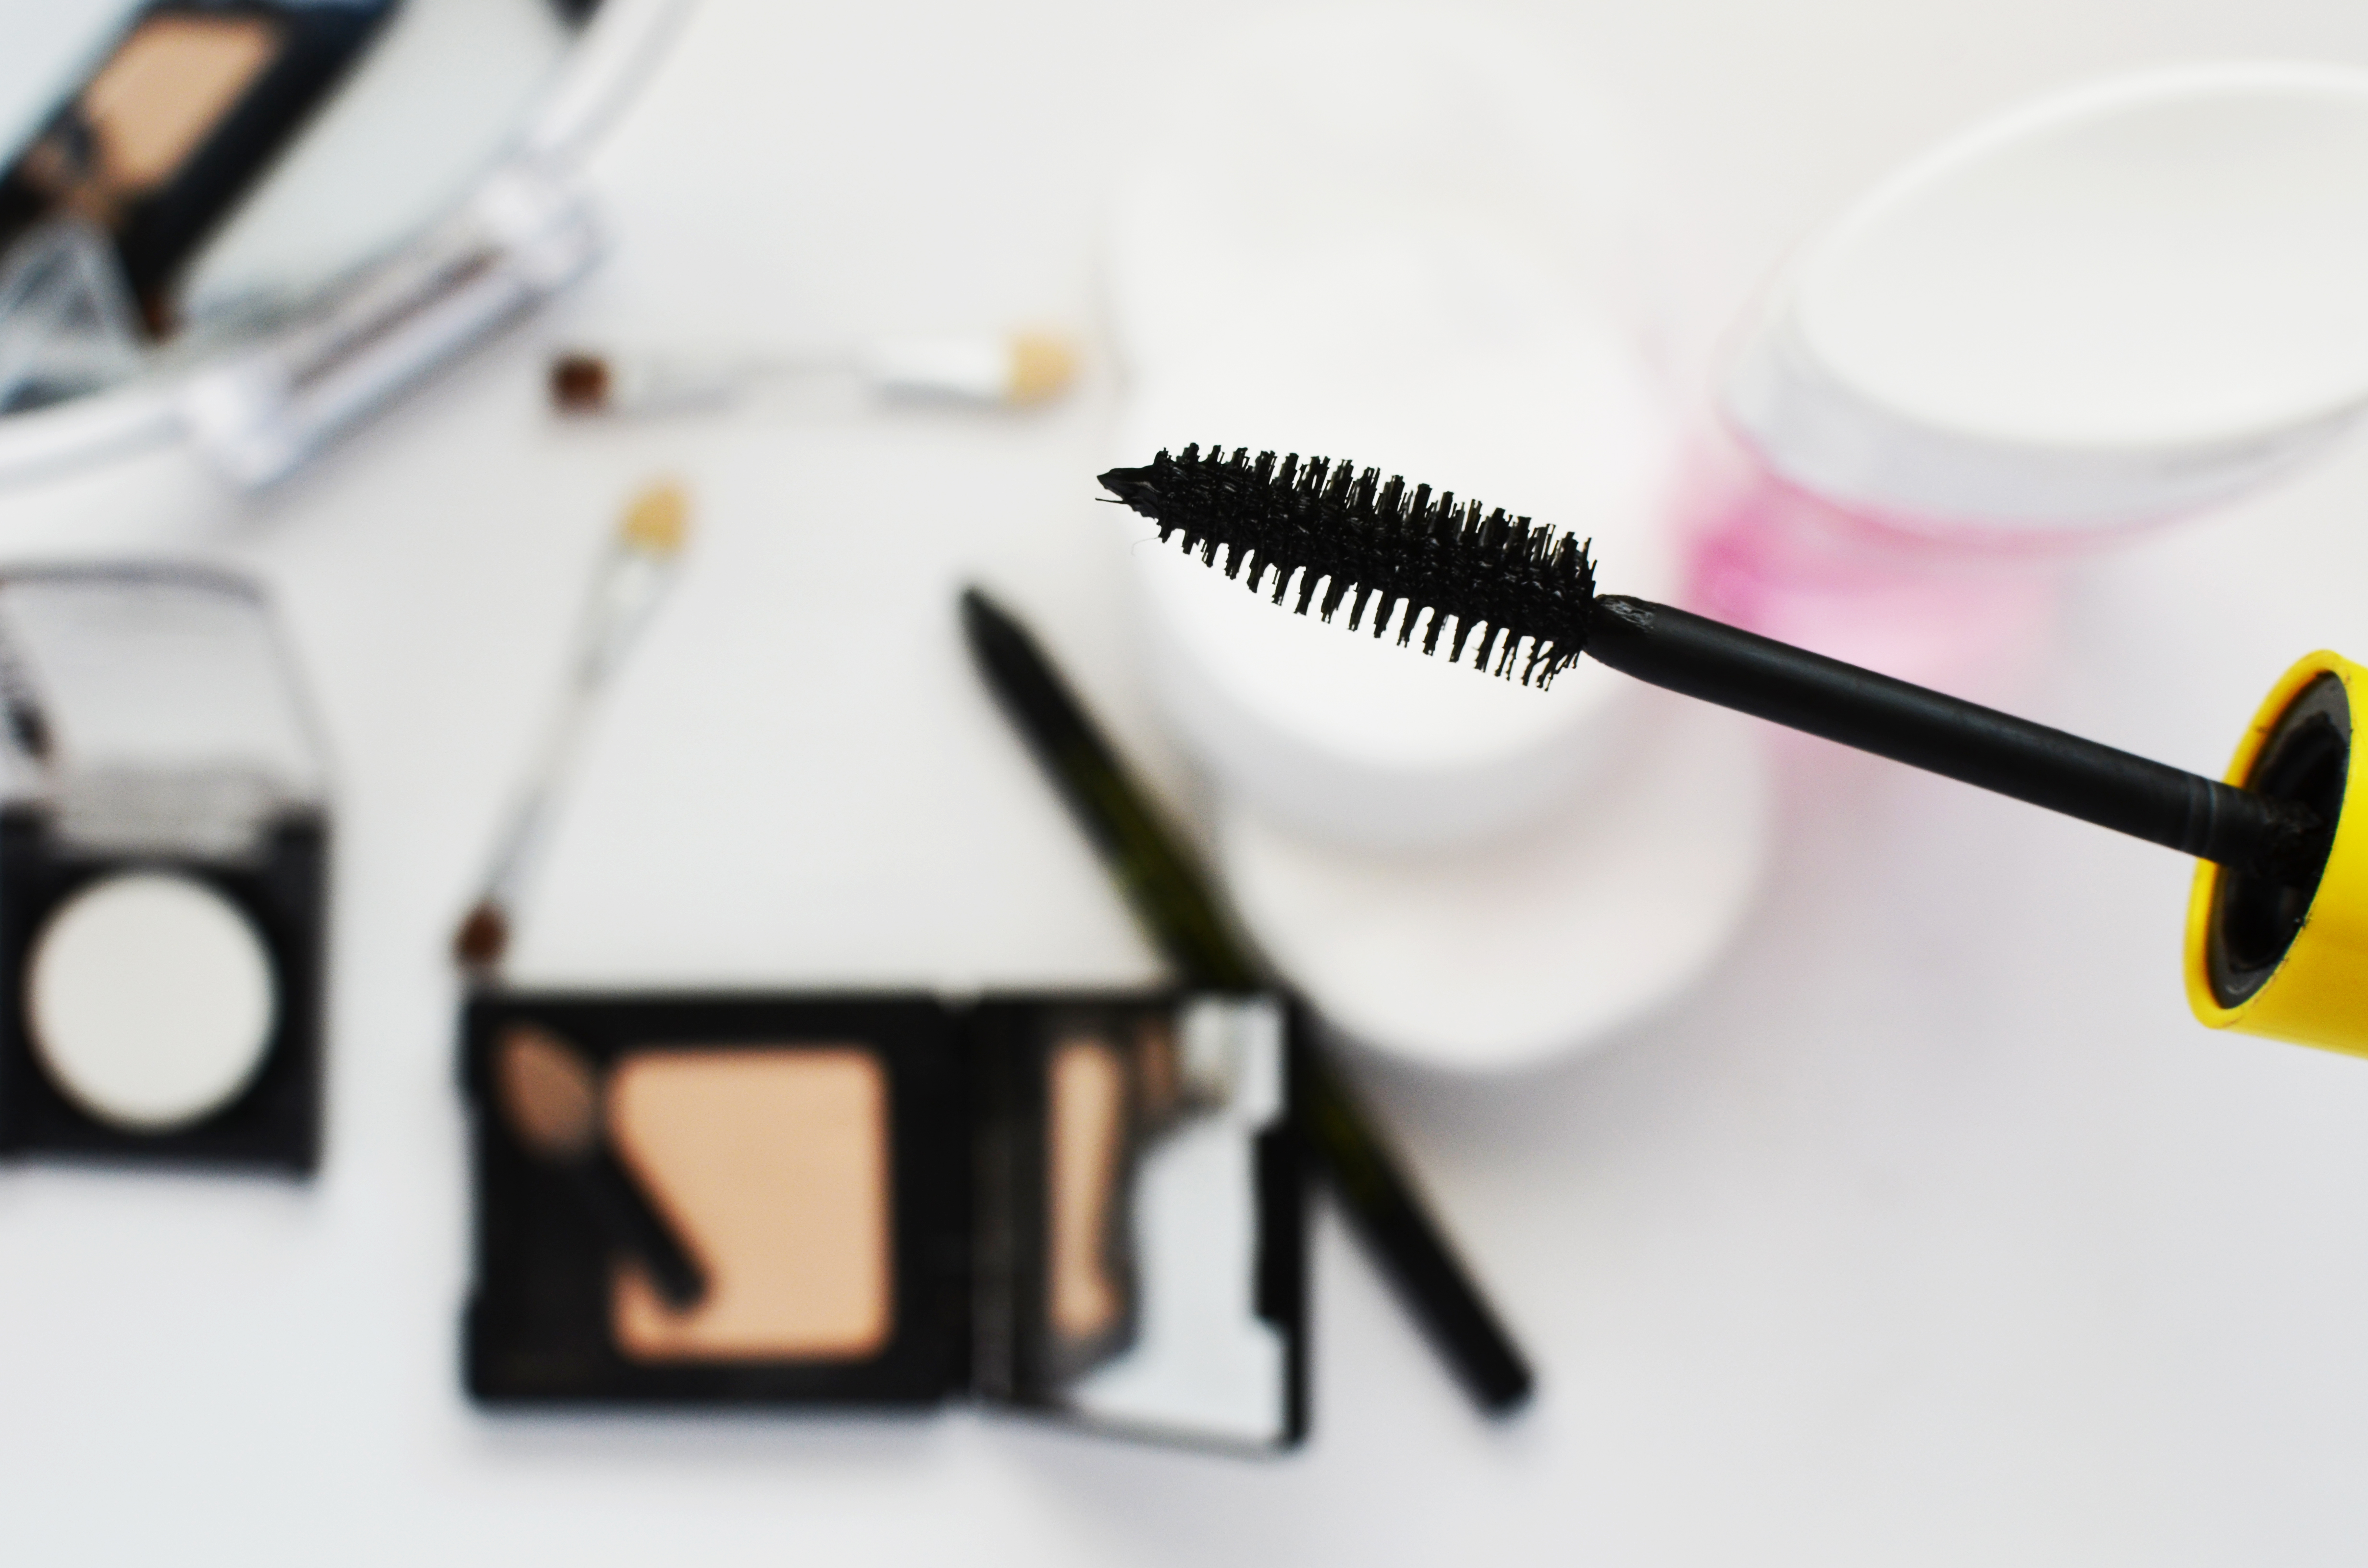 Натуральная и безопасная косметика бренда «Oriflame»